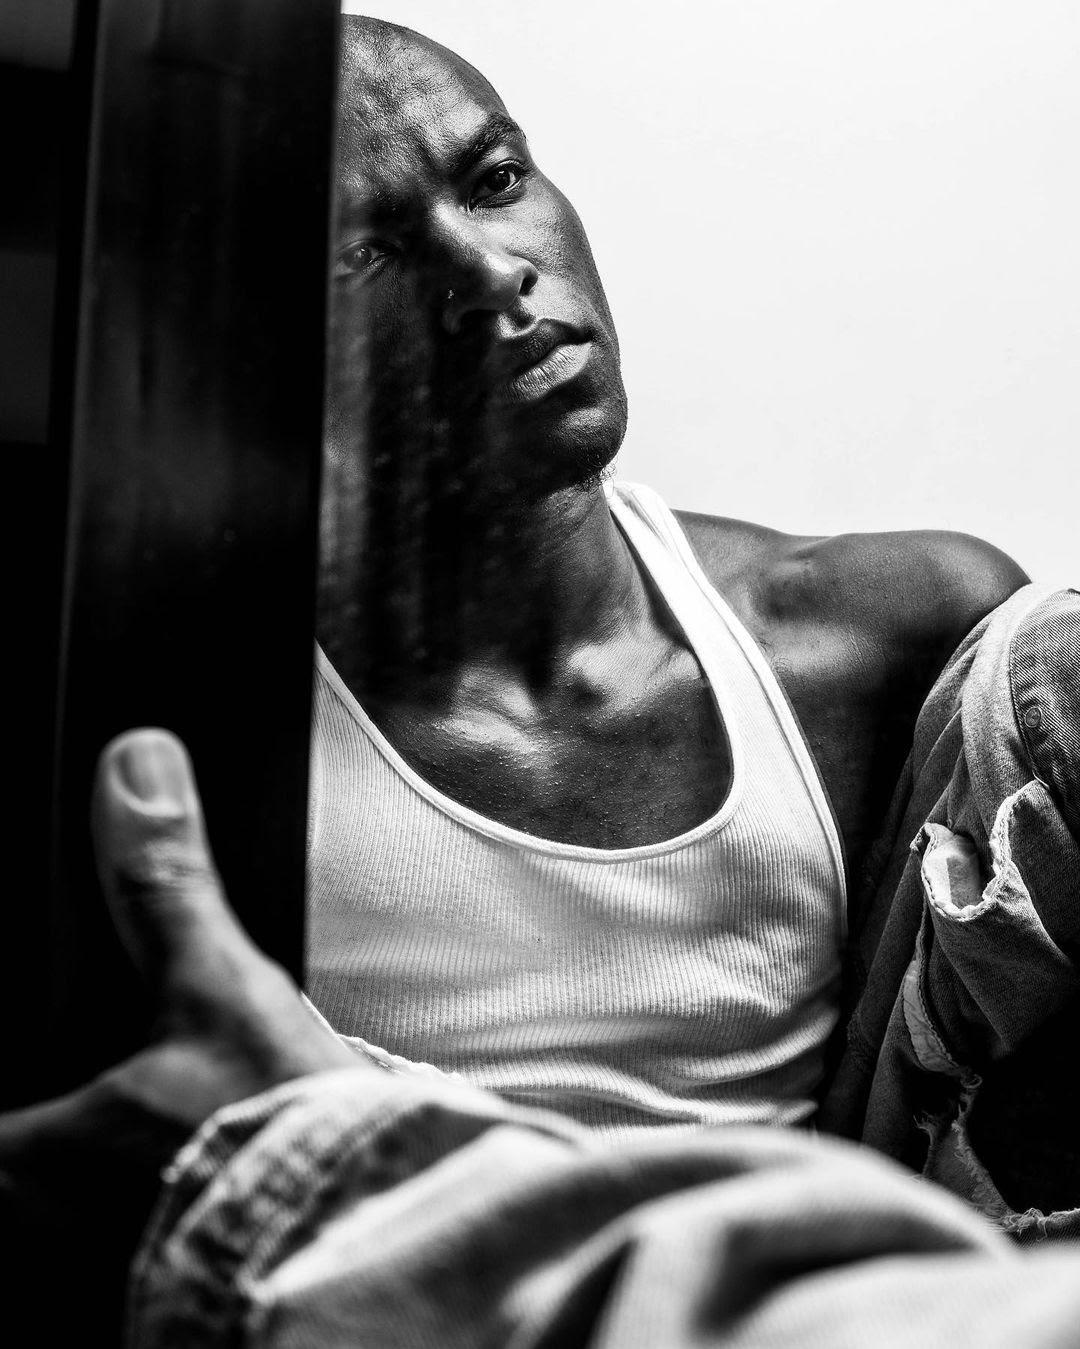 MaN in the MirroR, by Mike Esperanza ft Kendrick Samuel